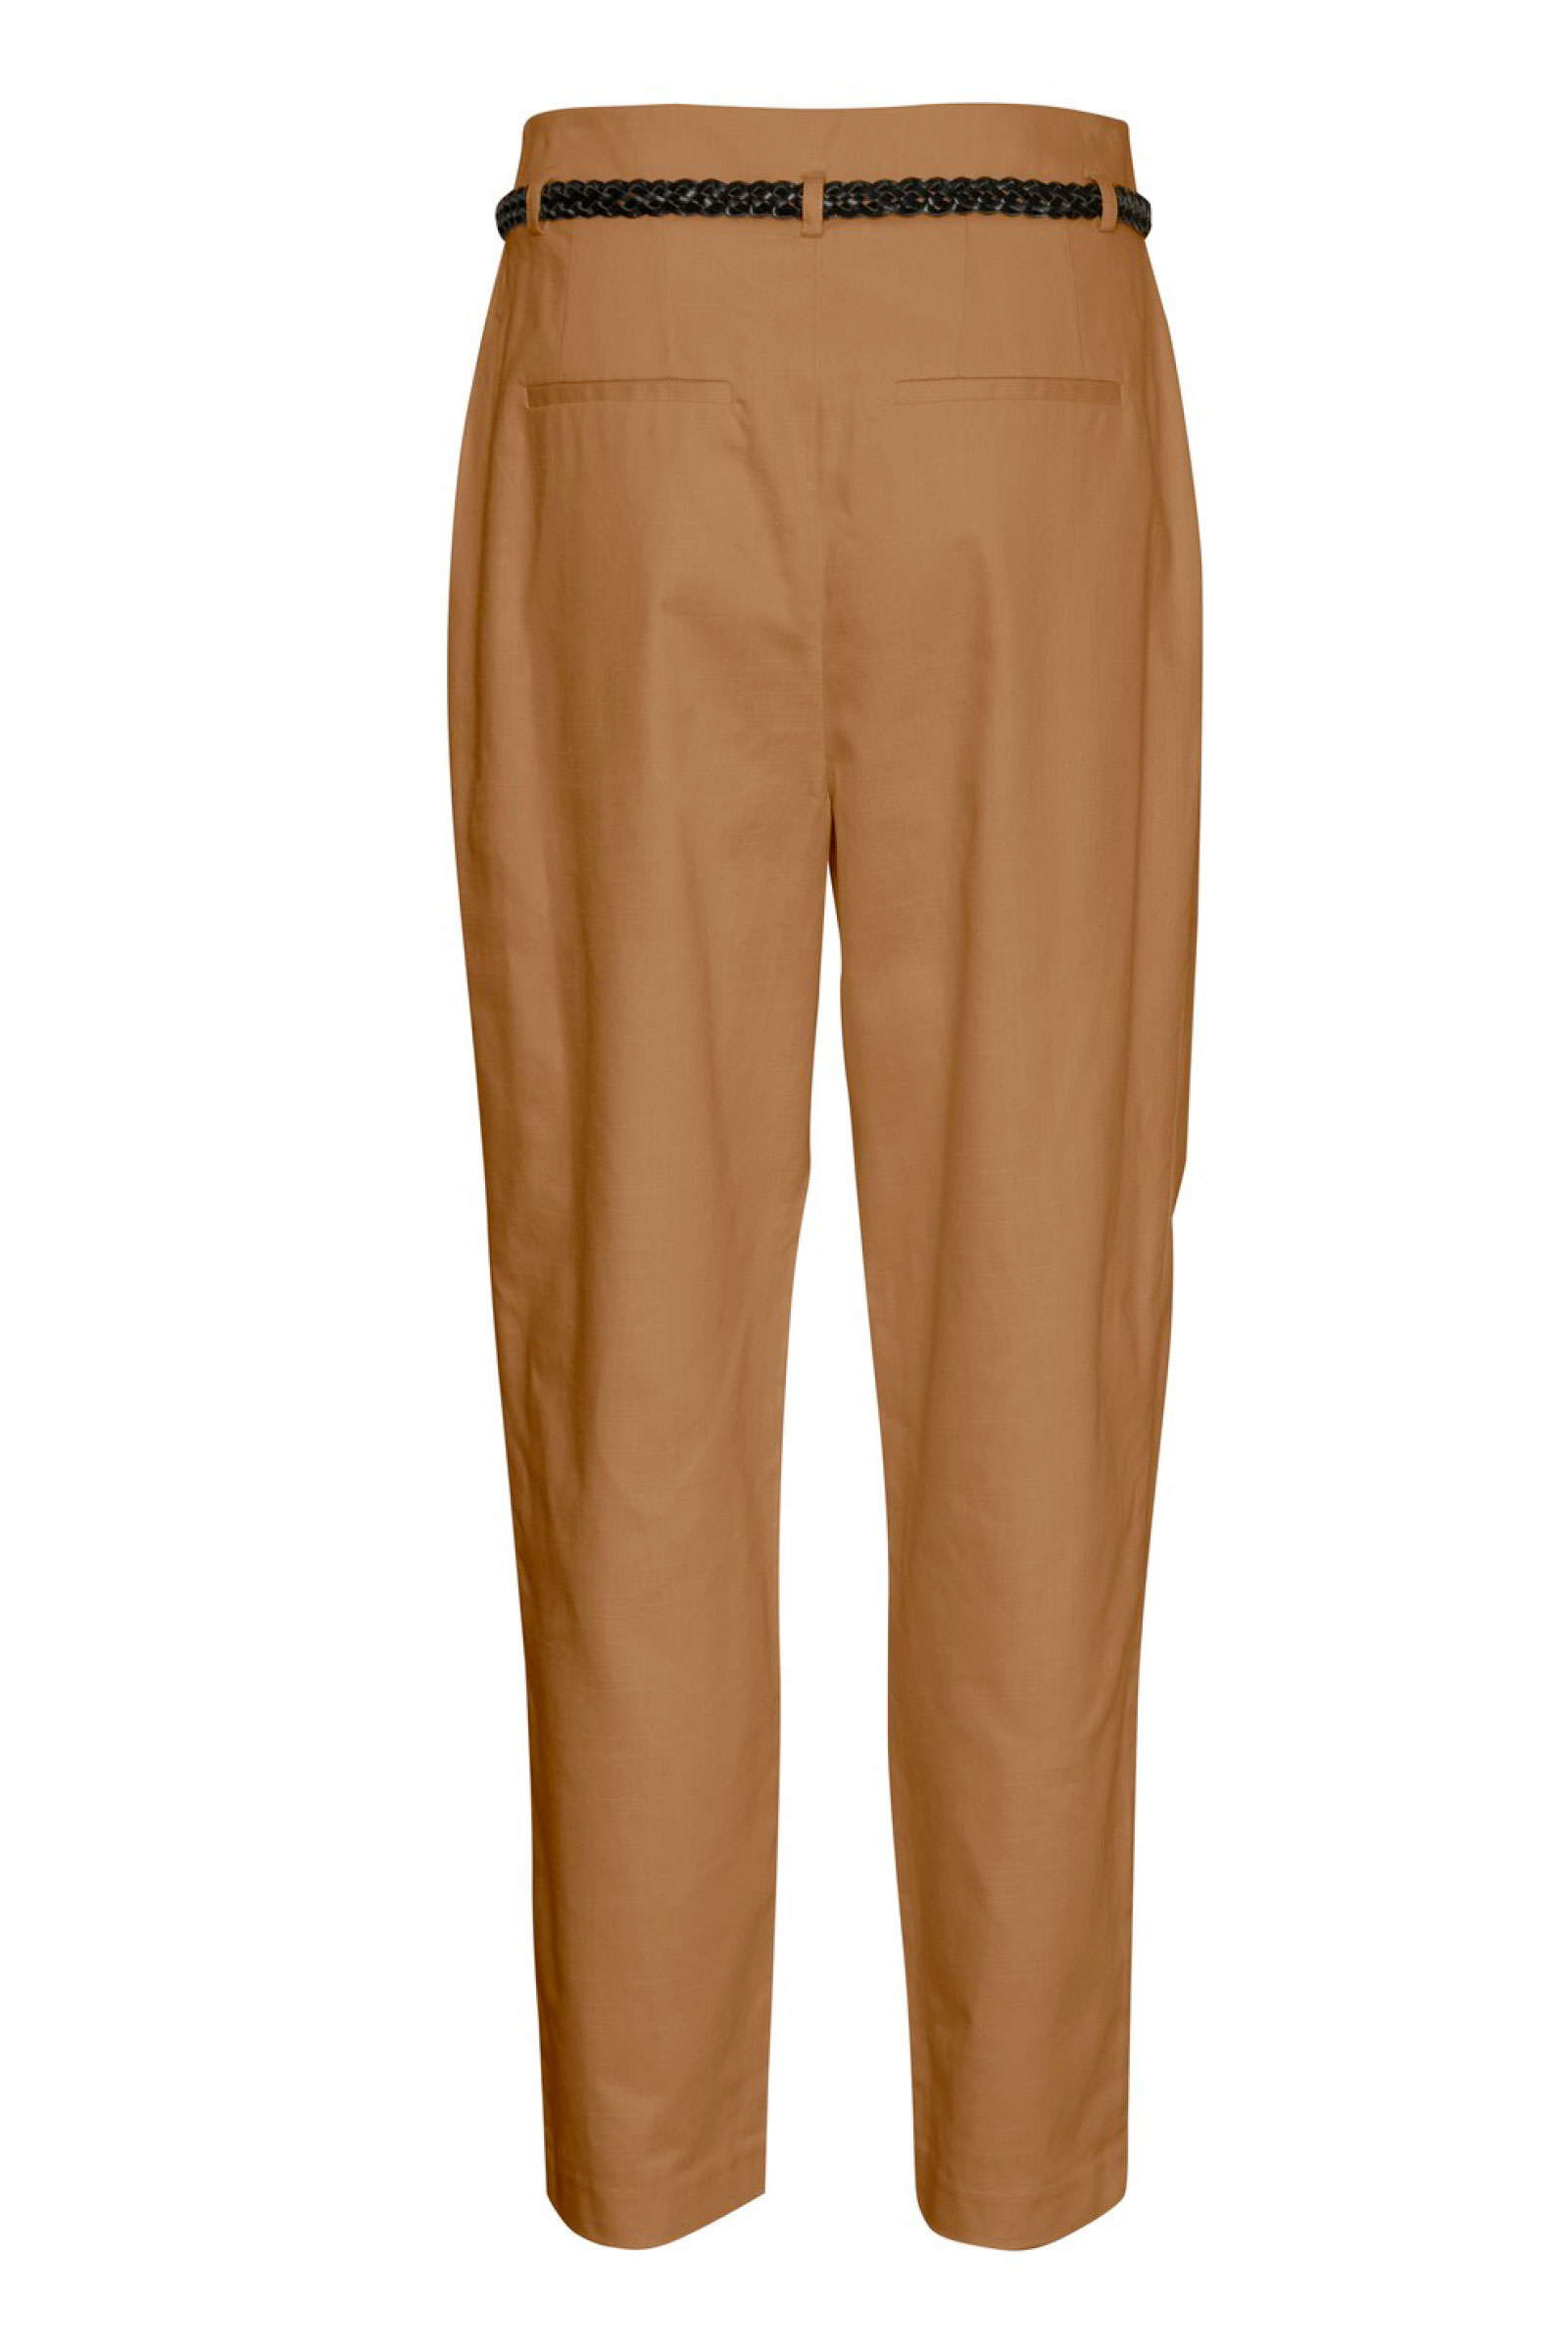 Pantalone Donna VERO MODA | Pantalone | 10247088Tobacco Brown